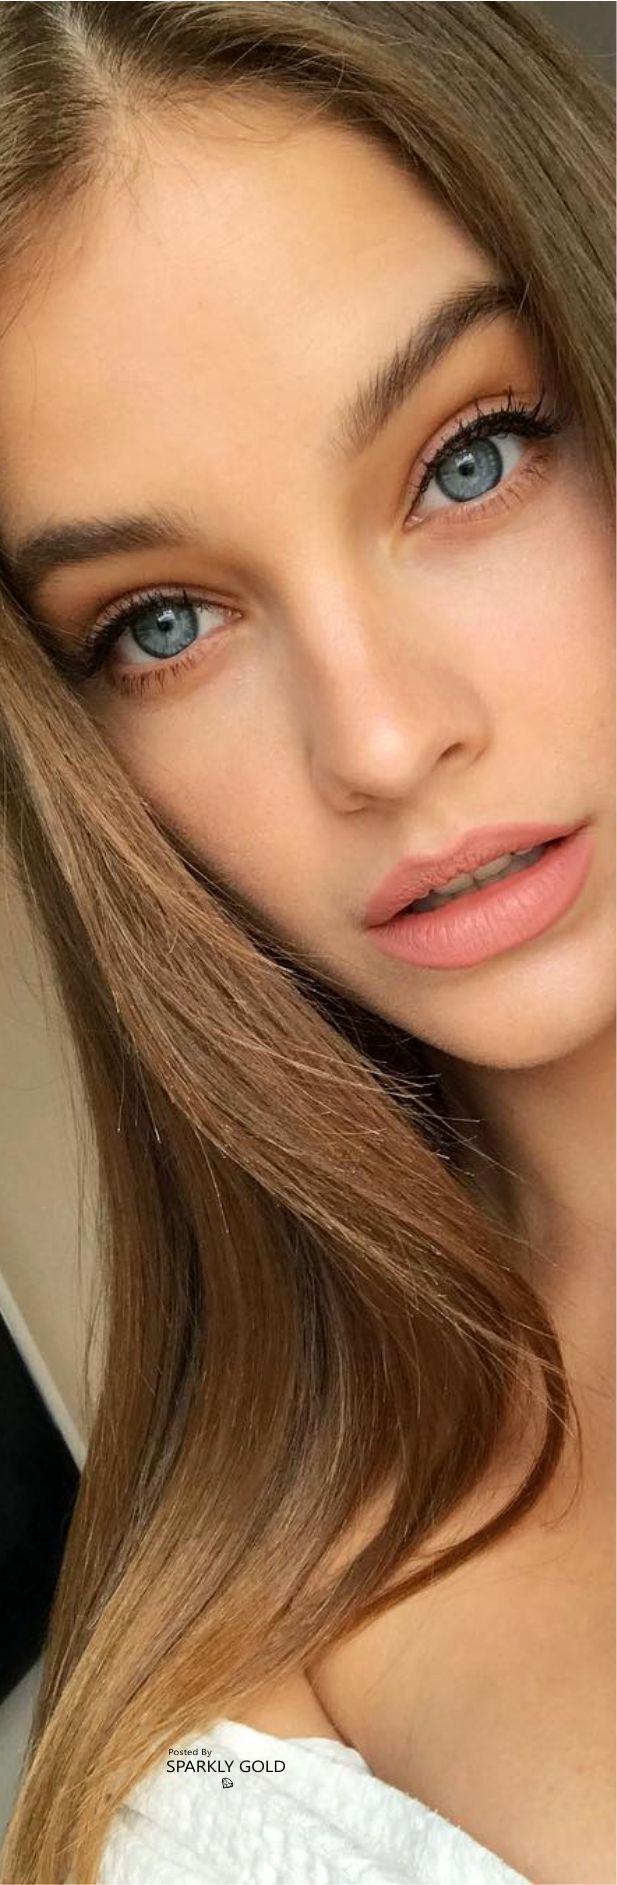 Barbara Palvin   Eyes in 2019   Barbara palvin, Beautiful